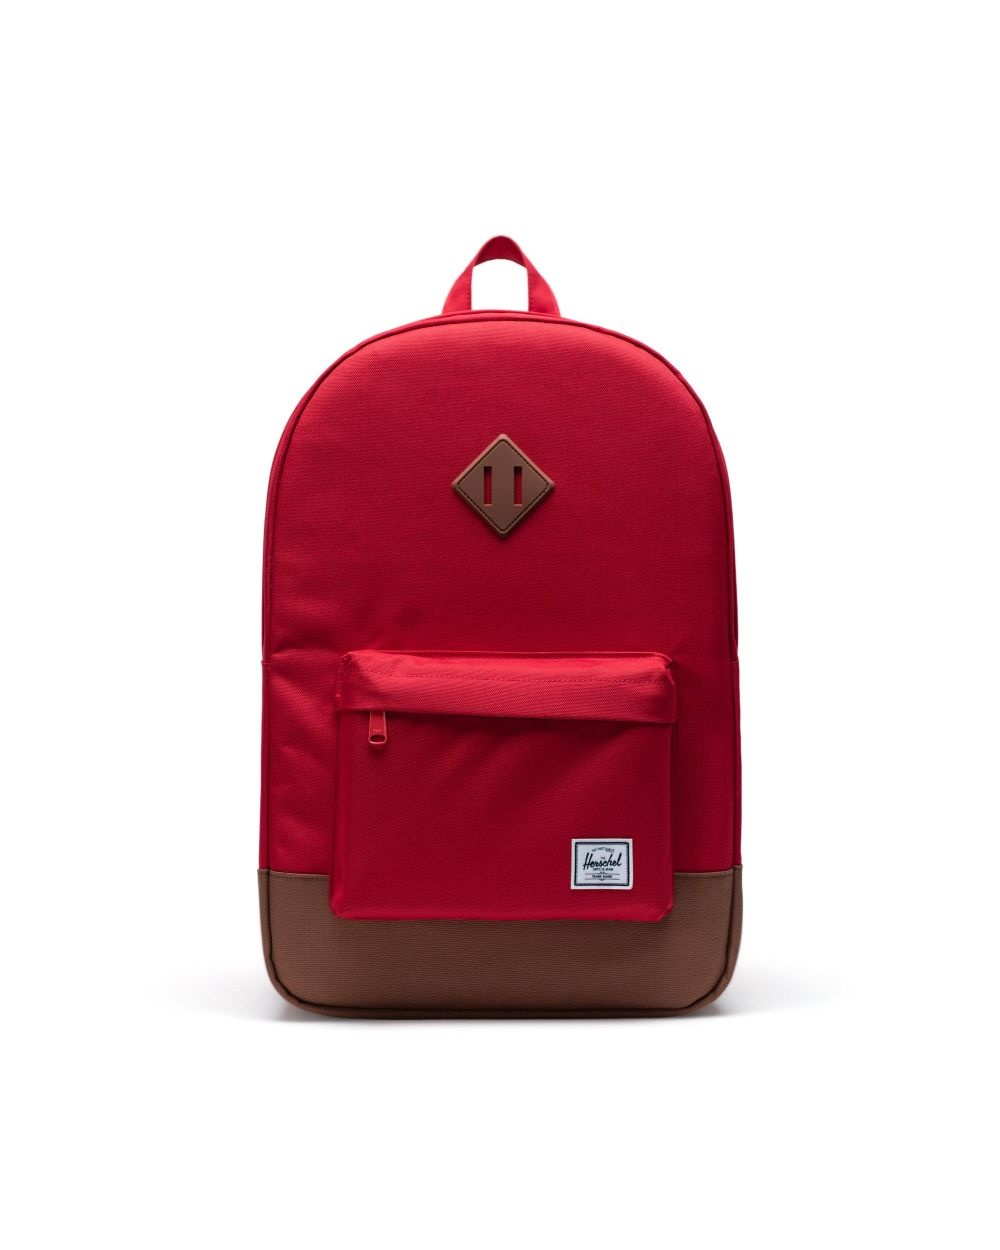 Herschel Heritage Red/Saddle brown